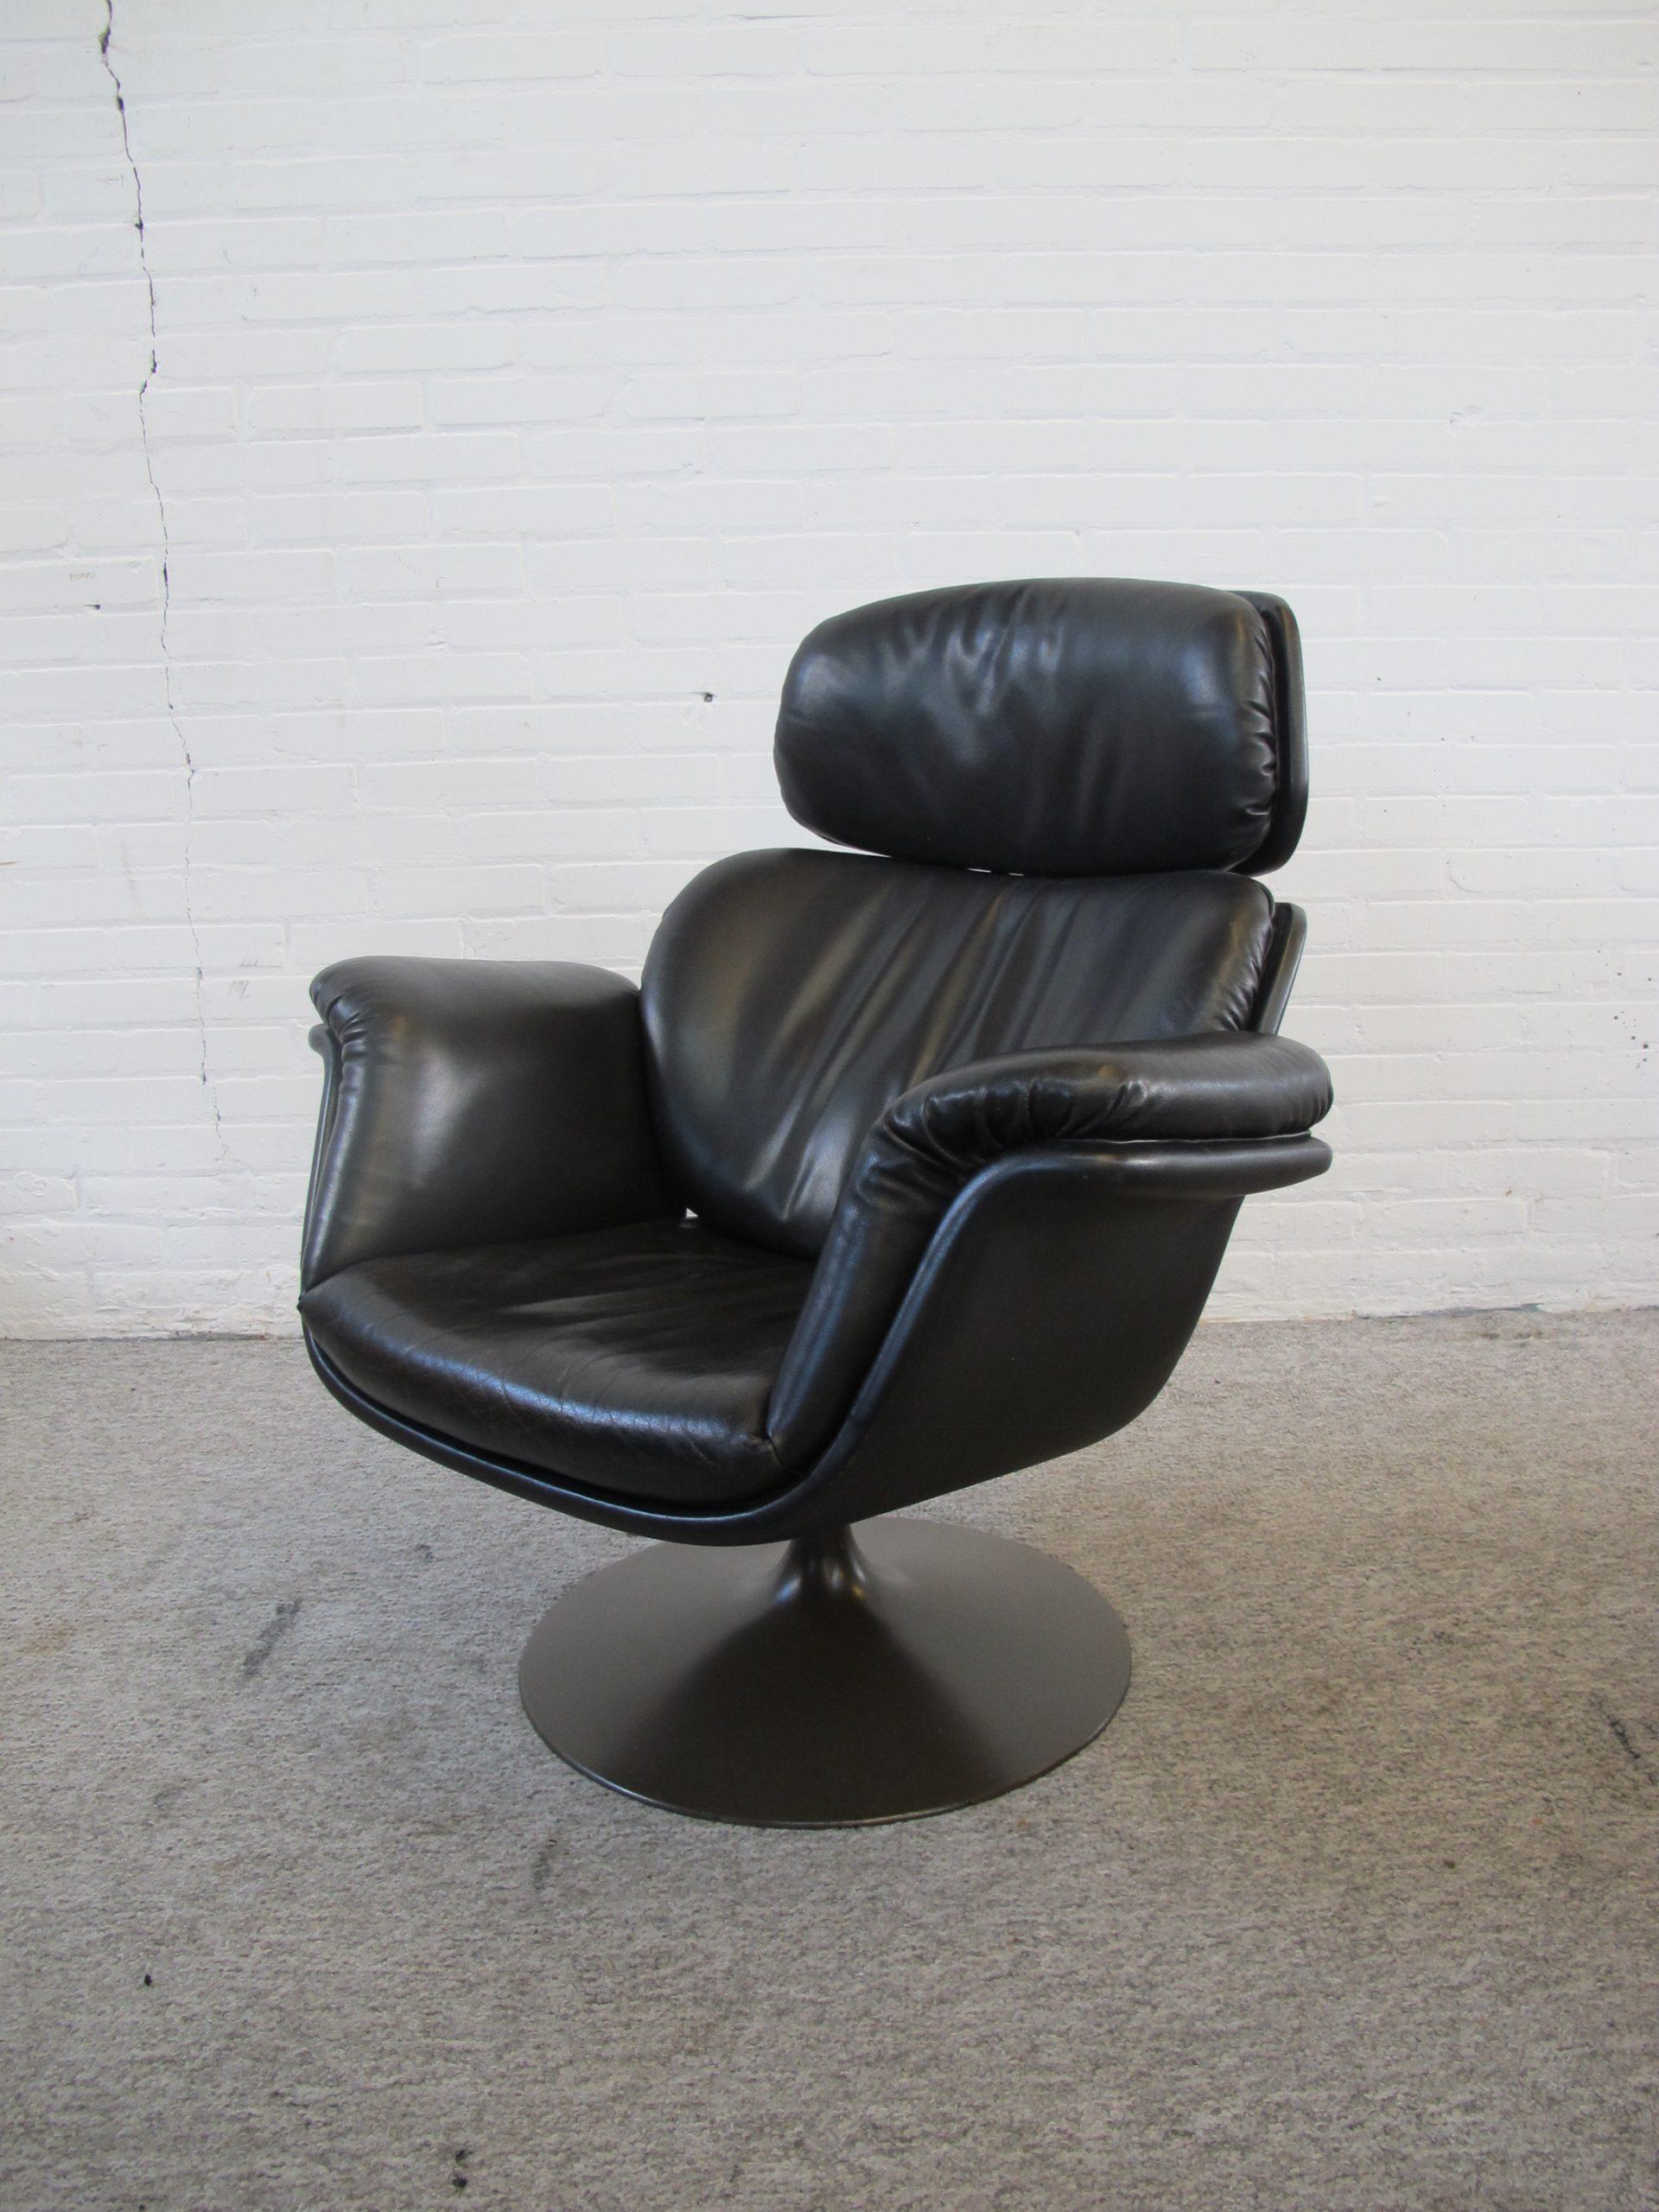 Fauteuil lounge chair F545 Big Tulip Pierre Paulin Artifort vintage midcentury